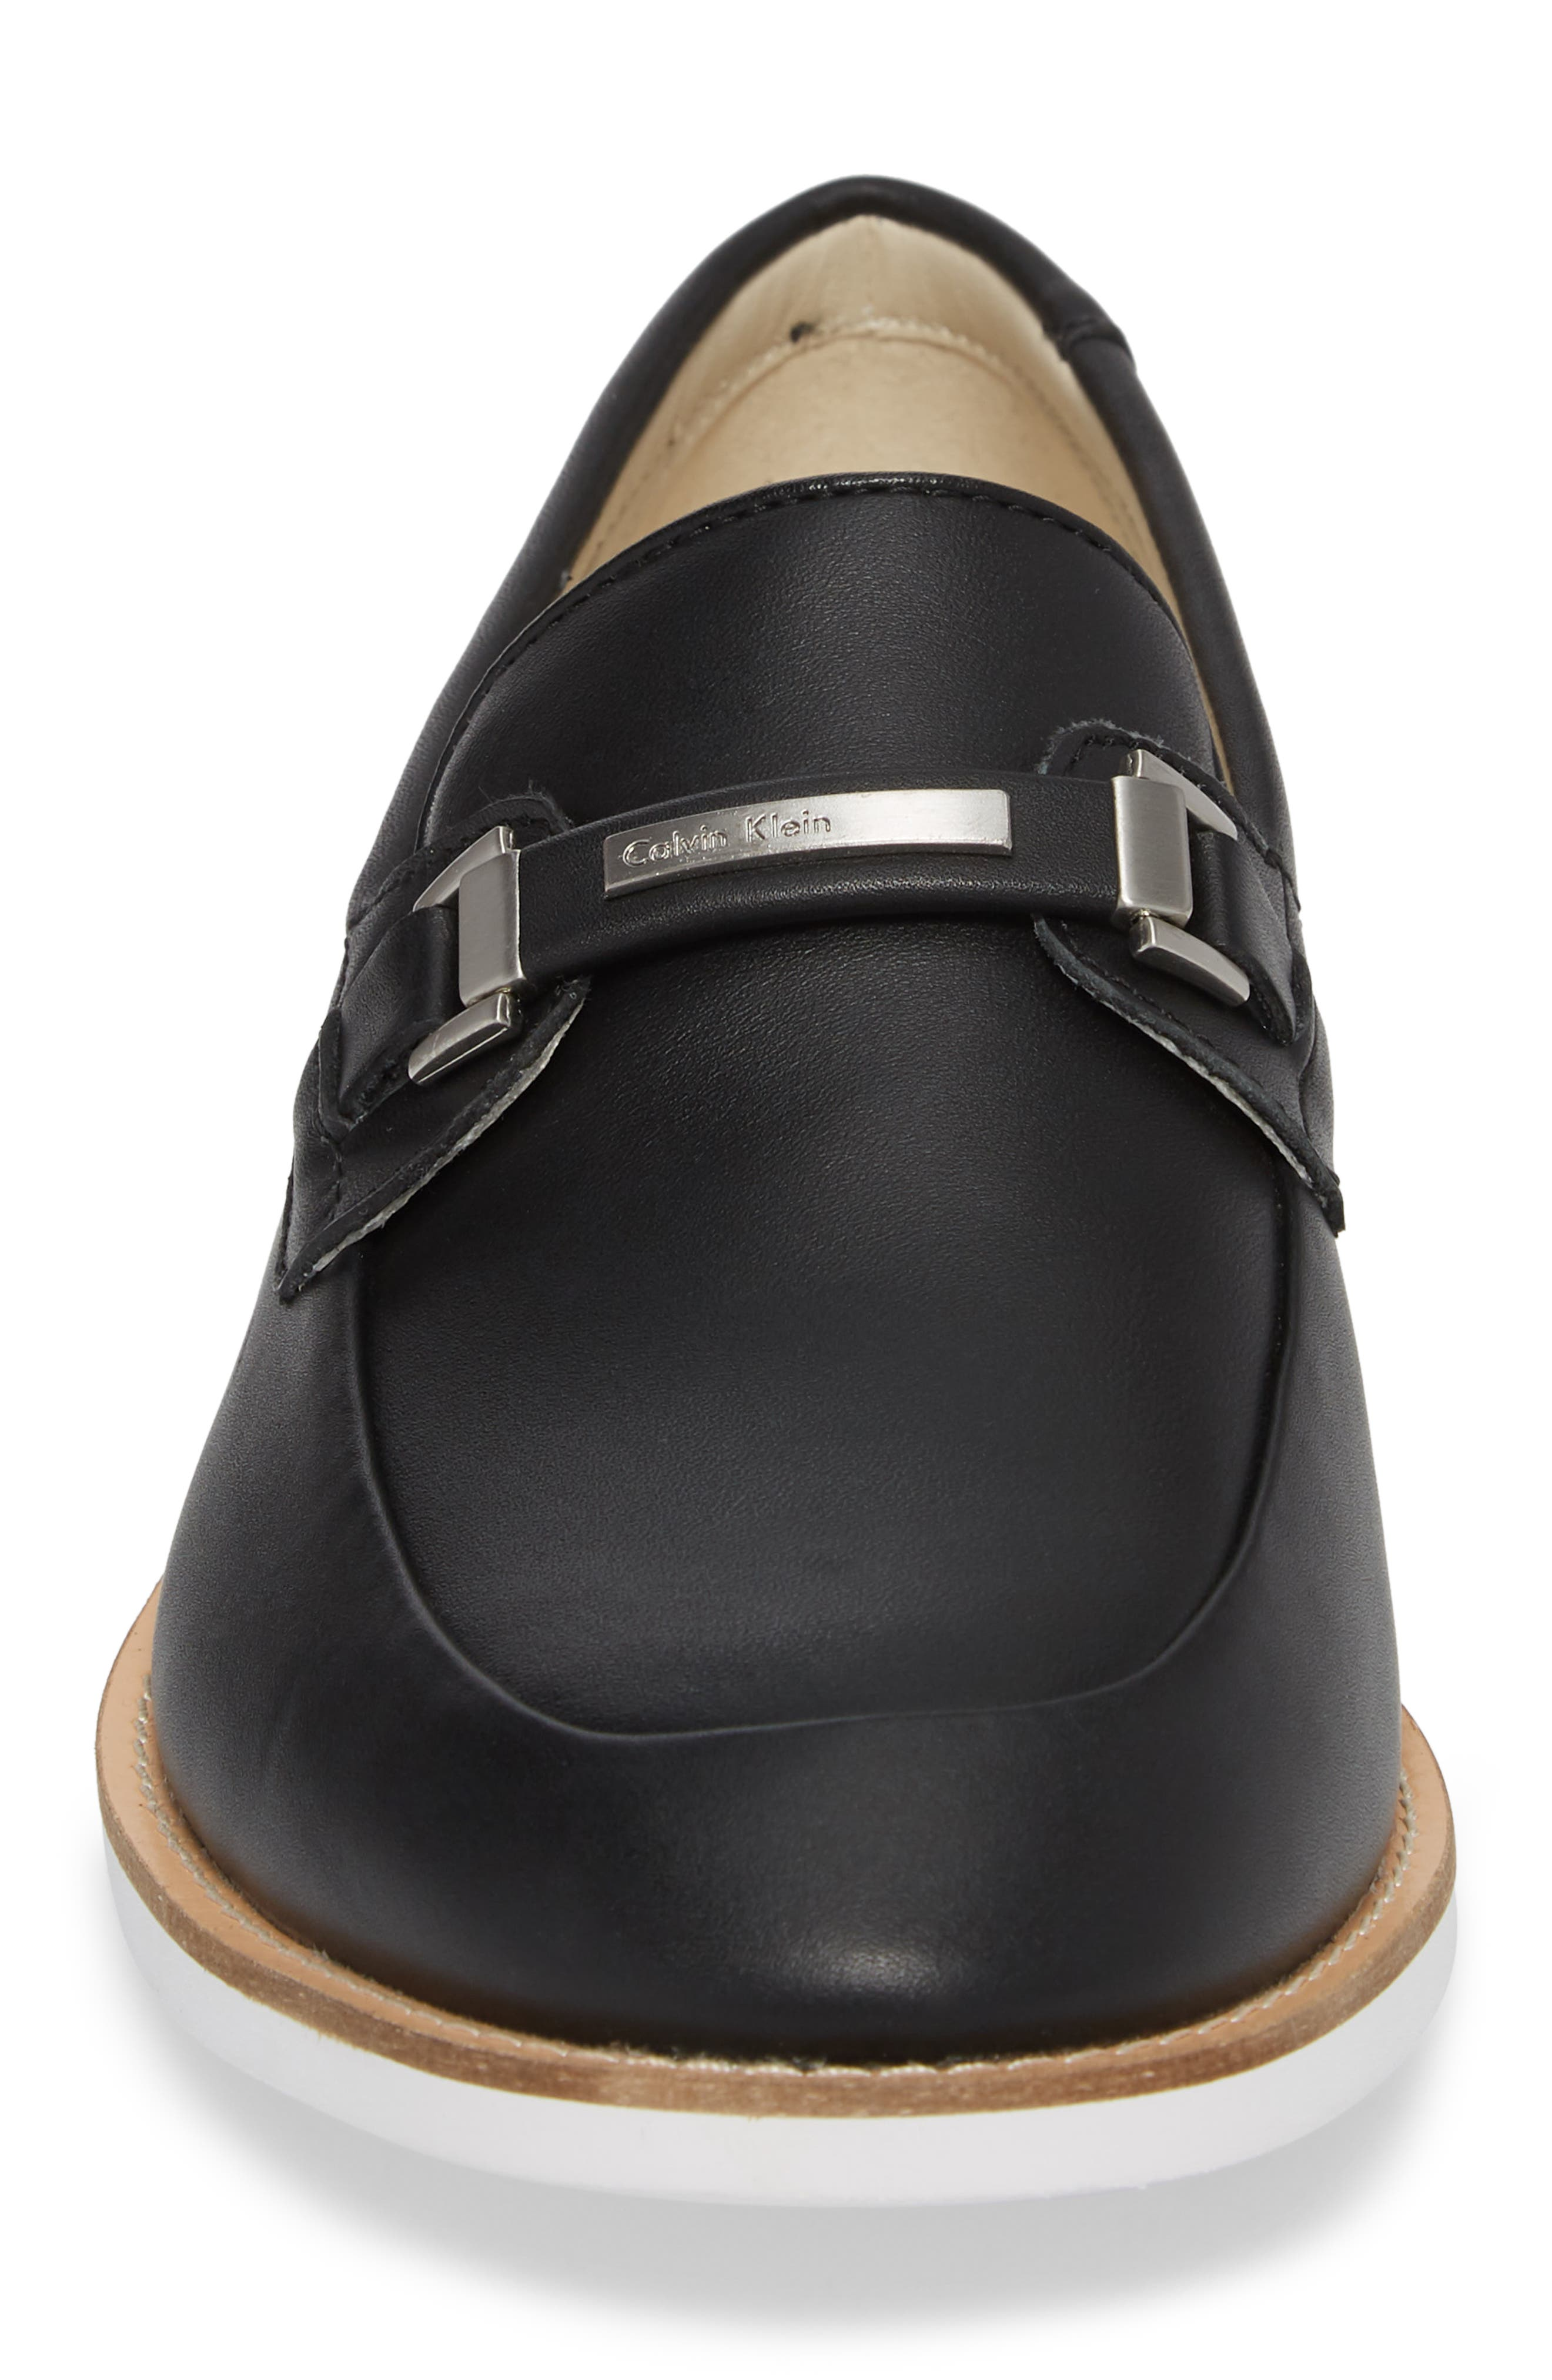 Adler Bit Loafer,                             Alternate thumbnail 4, color,                             Black Leather